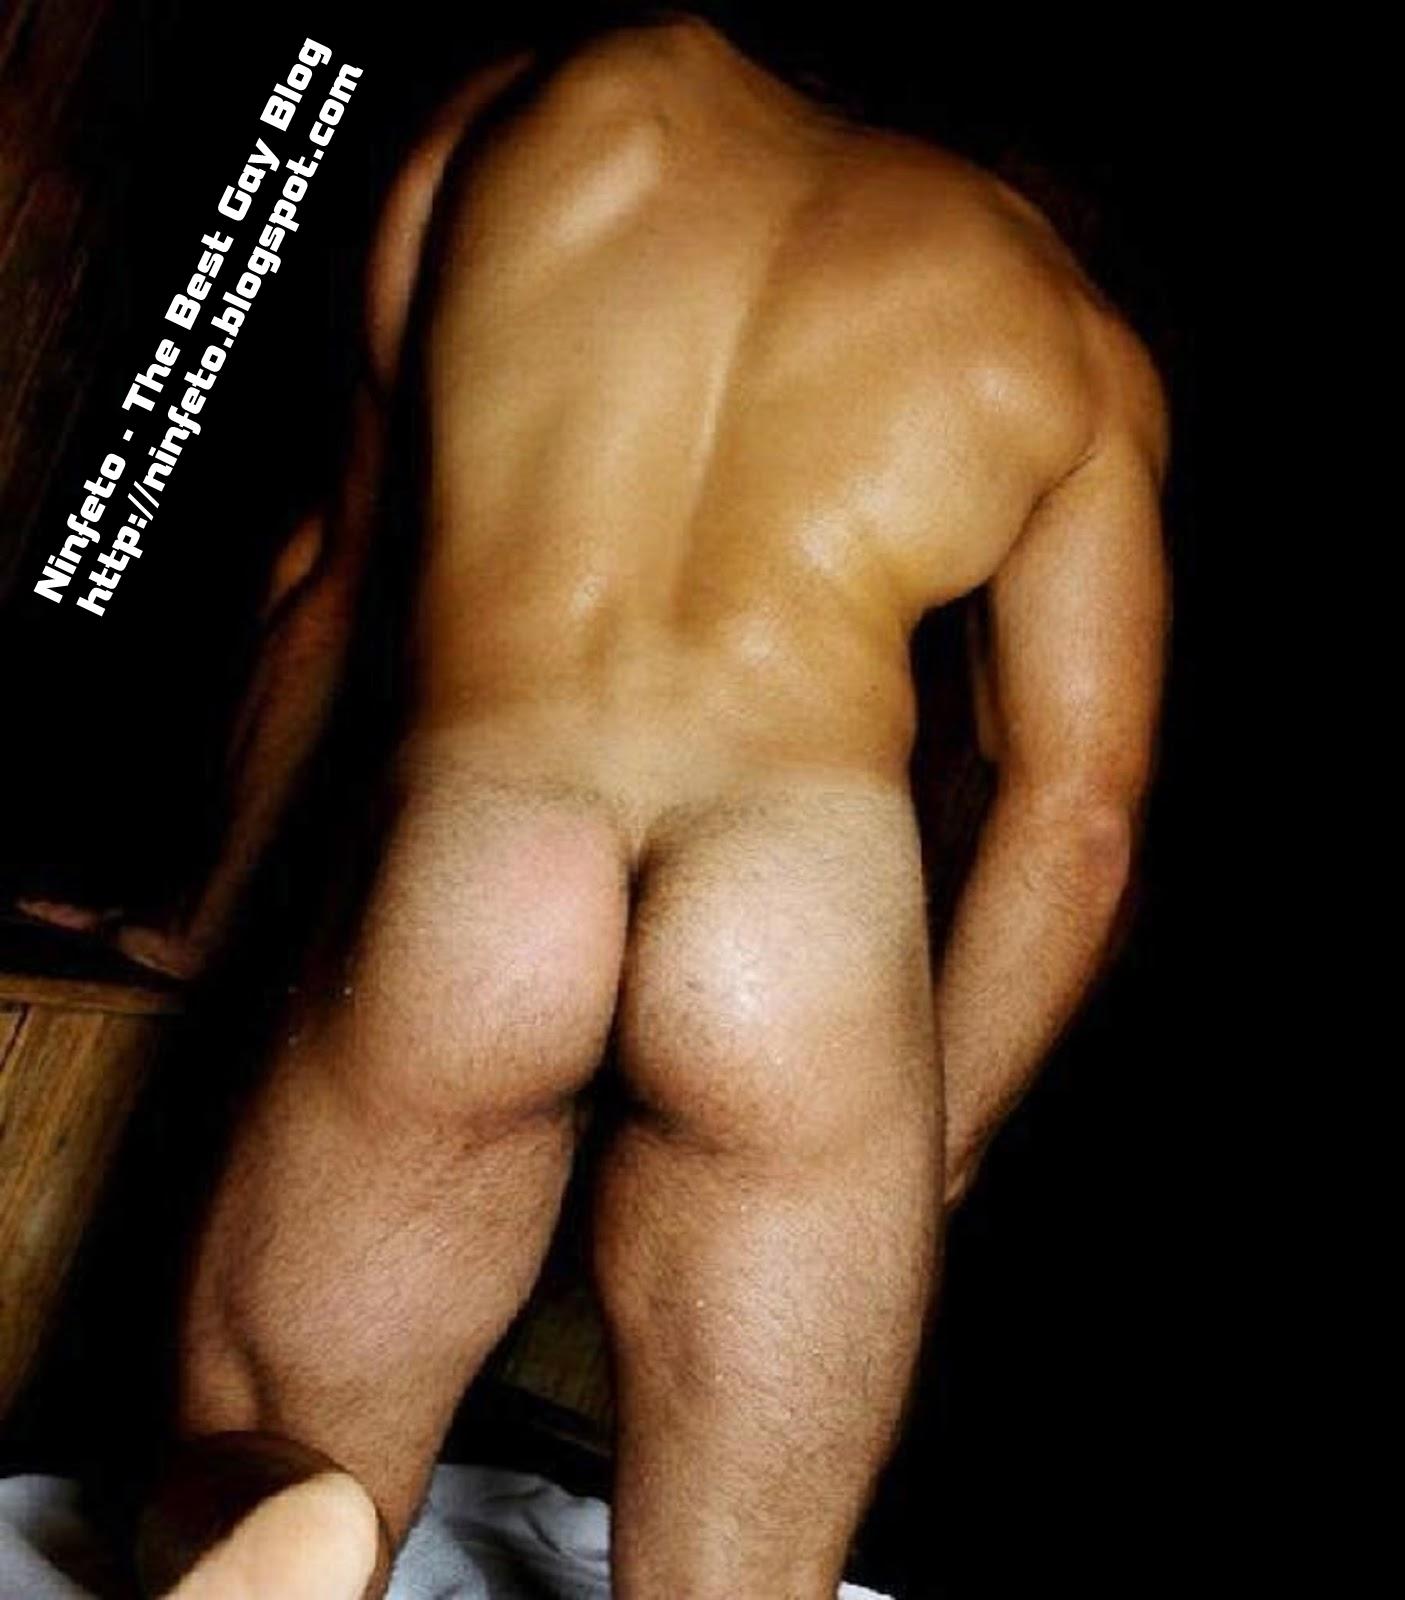 Bbw butt dailymotion